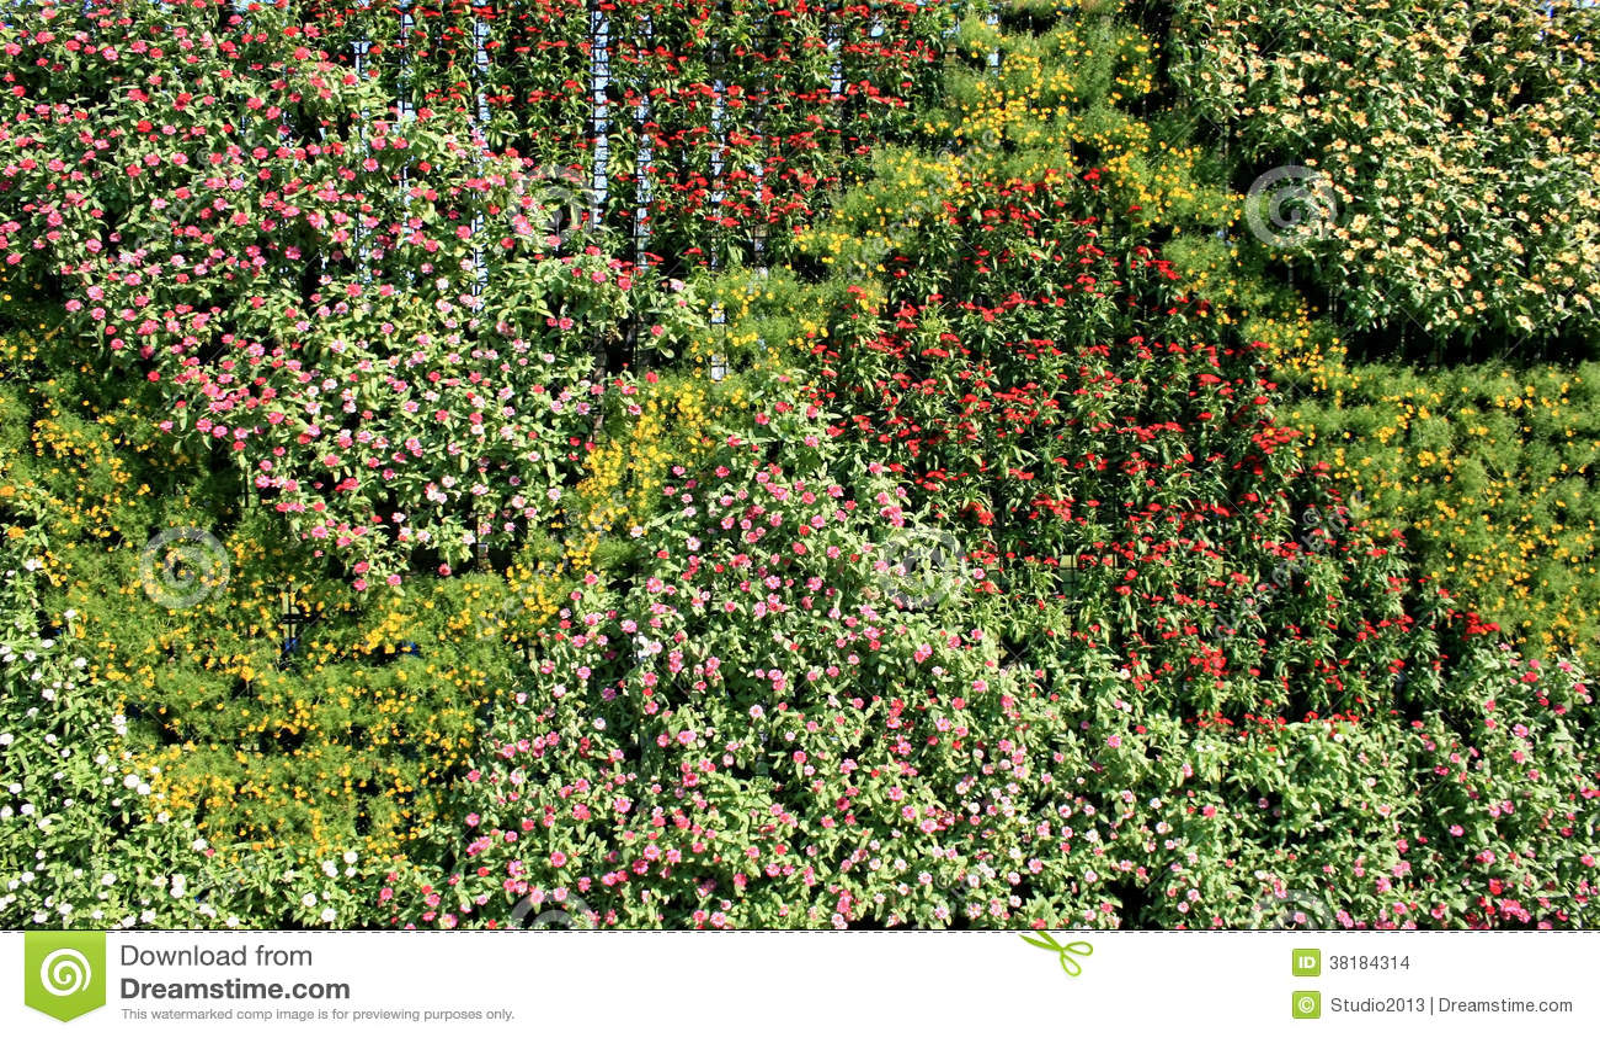 Flower wall vertical garden stock photo image of for Flower wall garden